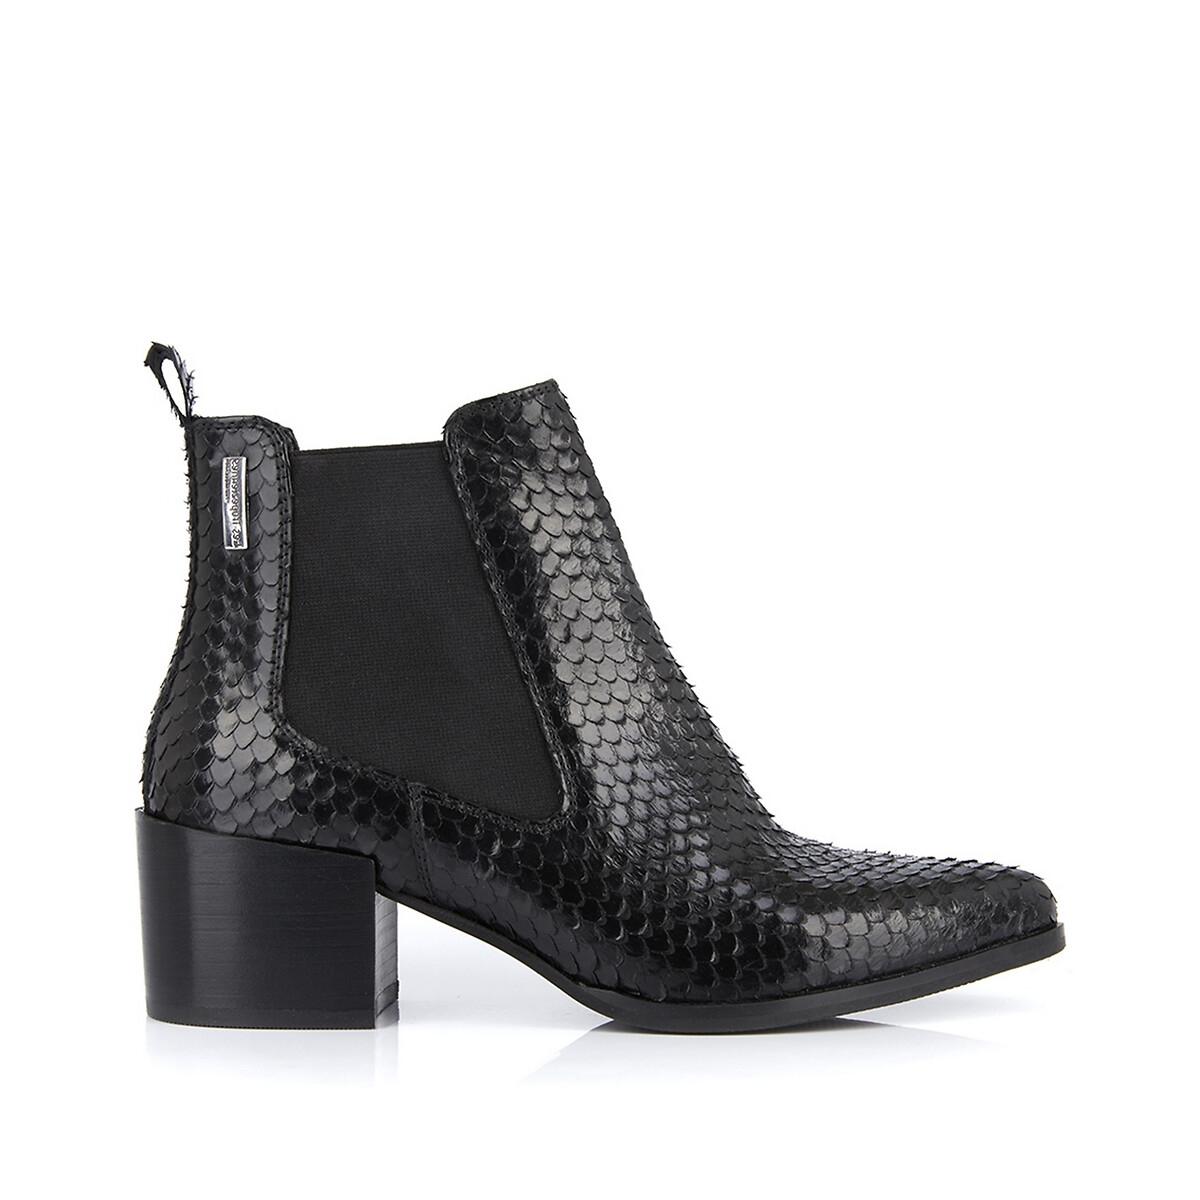 Kiwi Snake-Effect Leather Boots